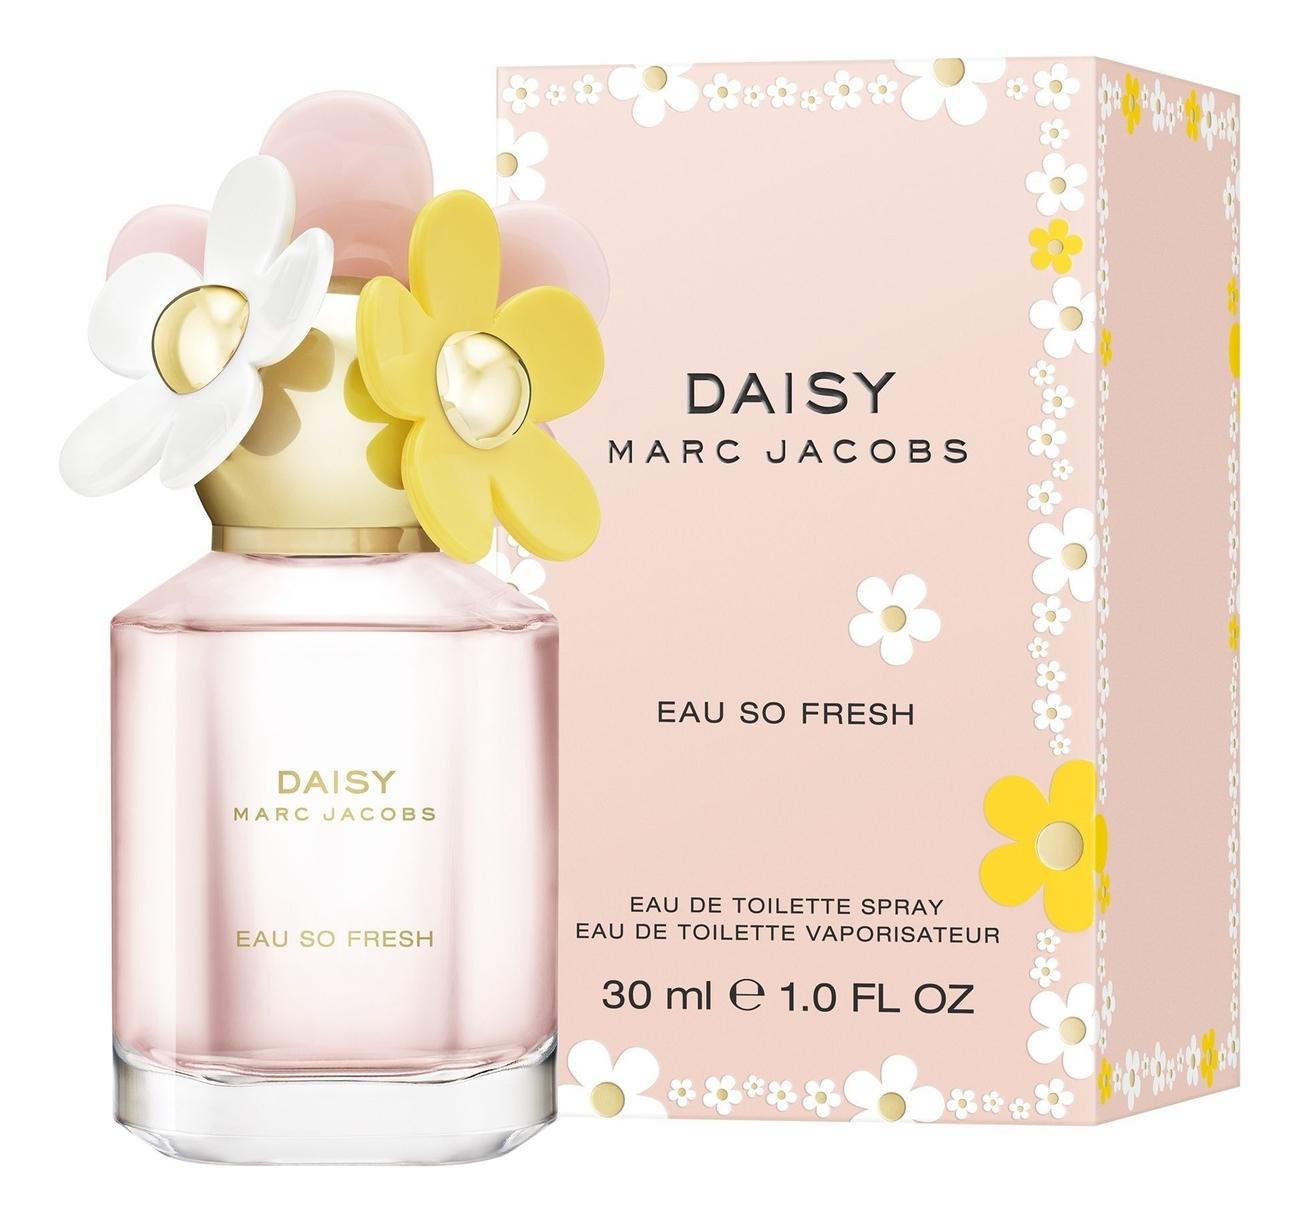 Купить Daisy Eau So Fresh: туалетная вода 30мл, Marc Jacobs